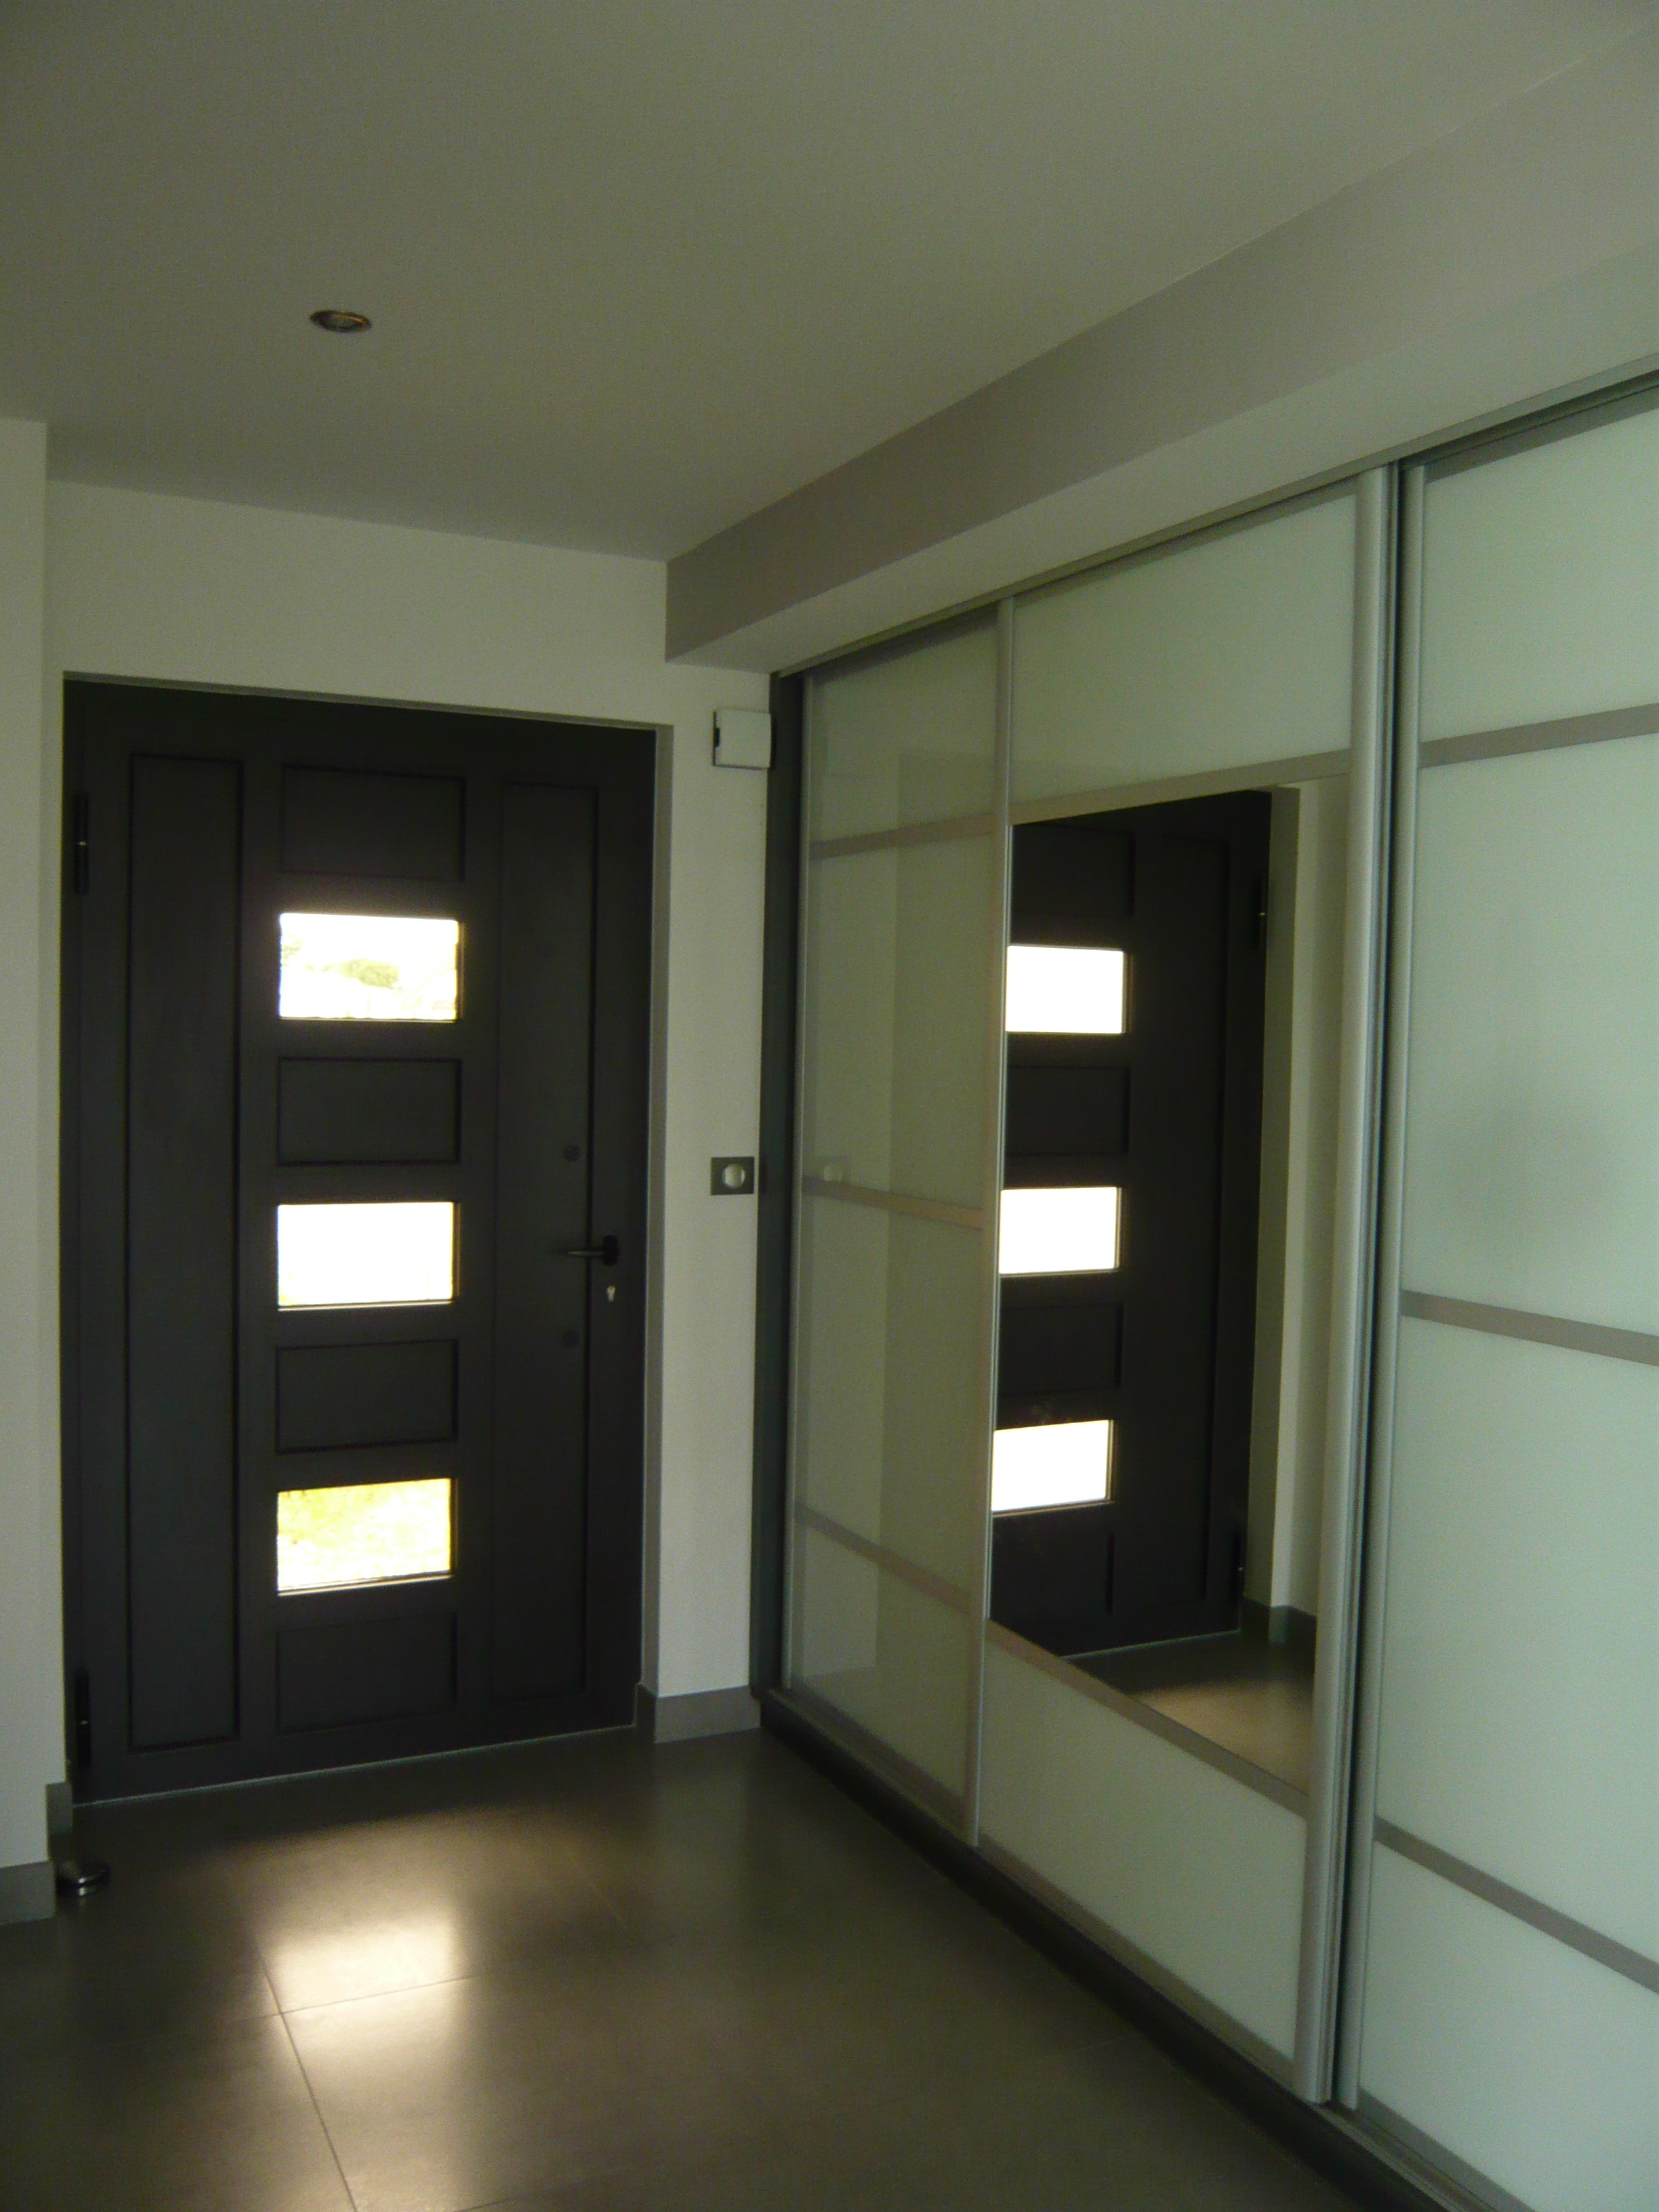 interview de nabelle construction village neuf. Black Bedroom Furniture Sets. Home Design Ideas